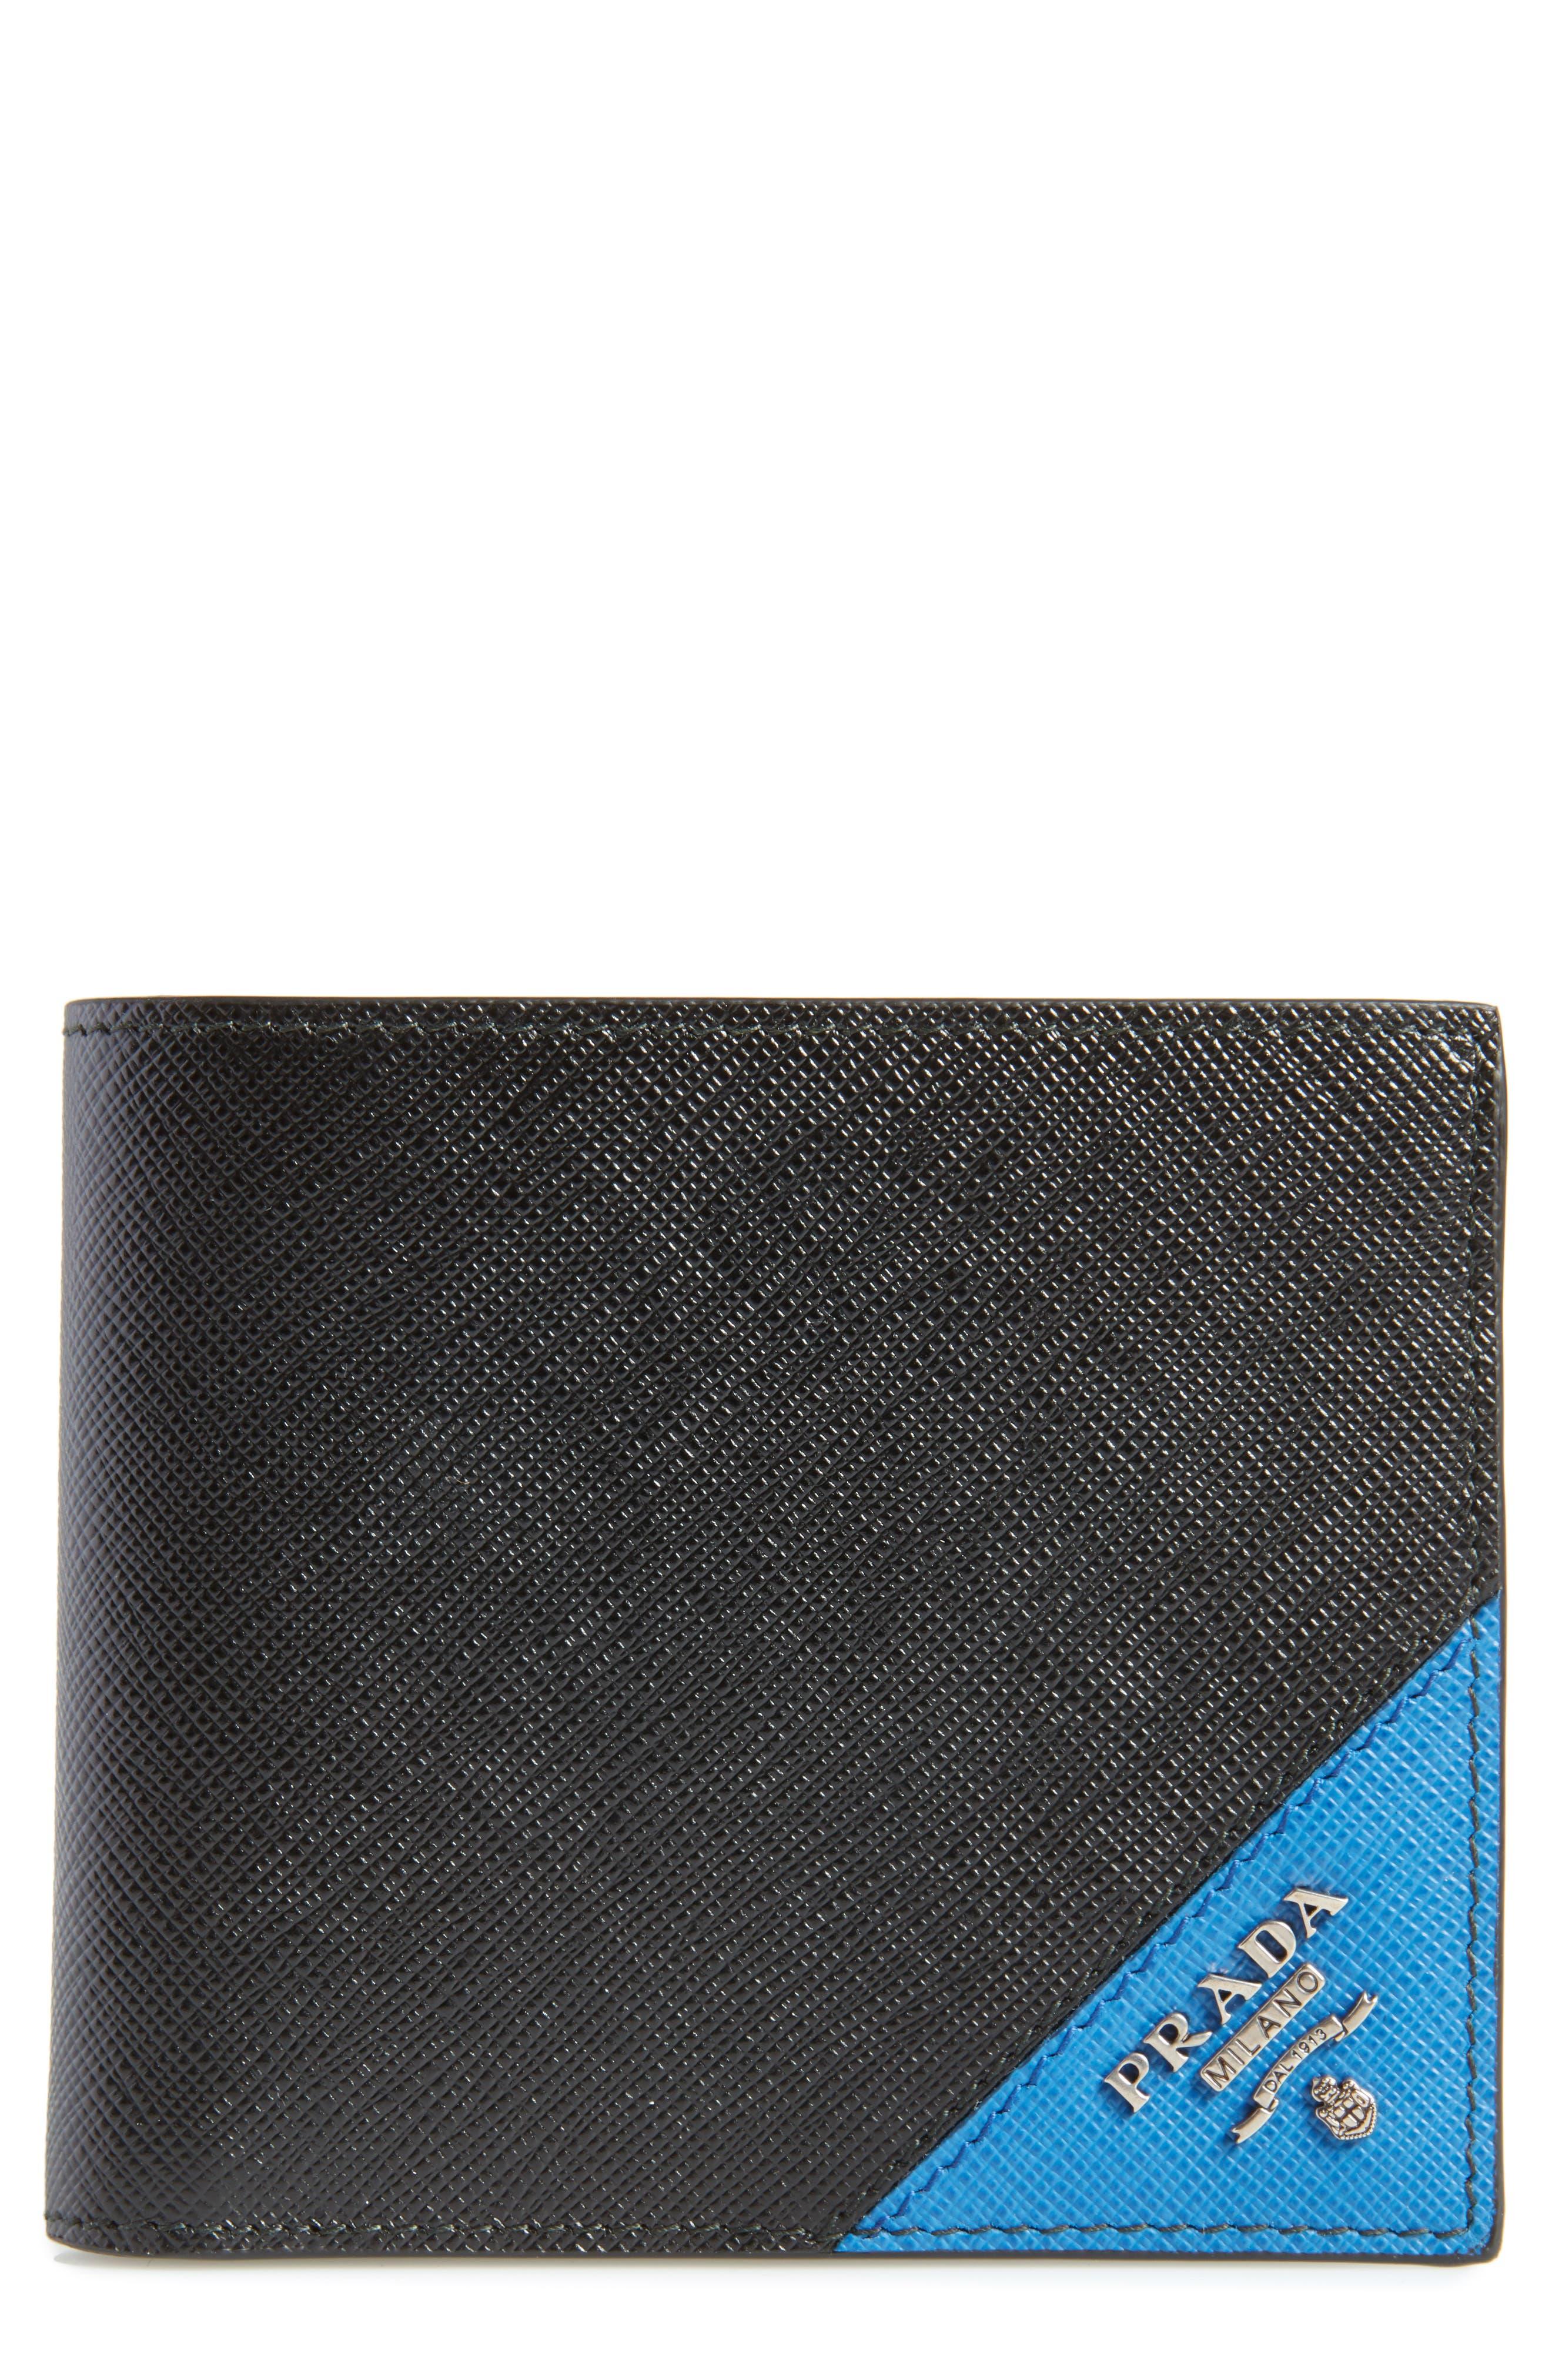 PRADA, Saffiano Leather Billfold Wallet, Main thumbnail 1, color, NERO AND CERISE